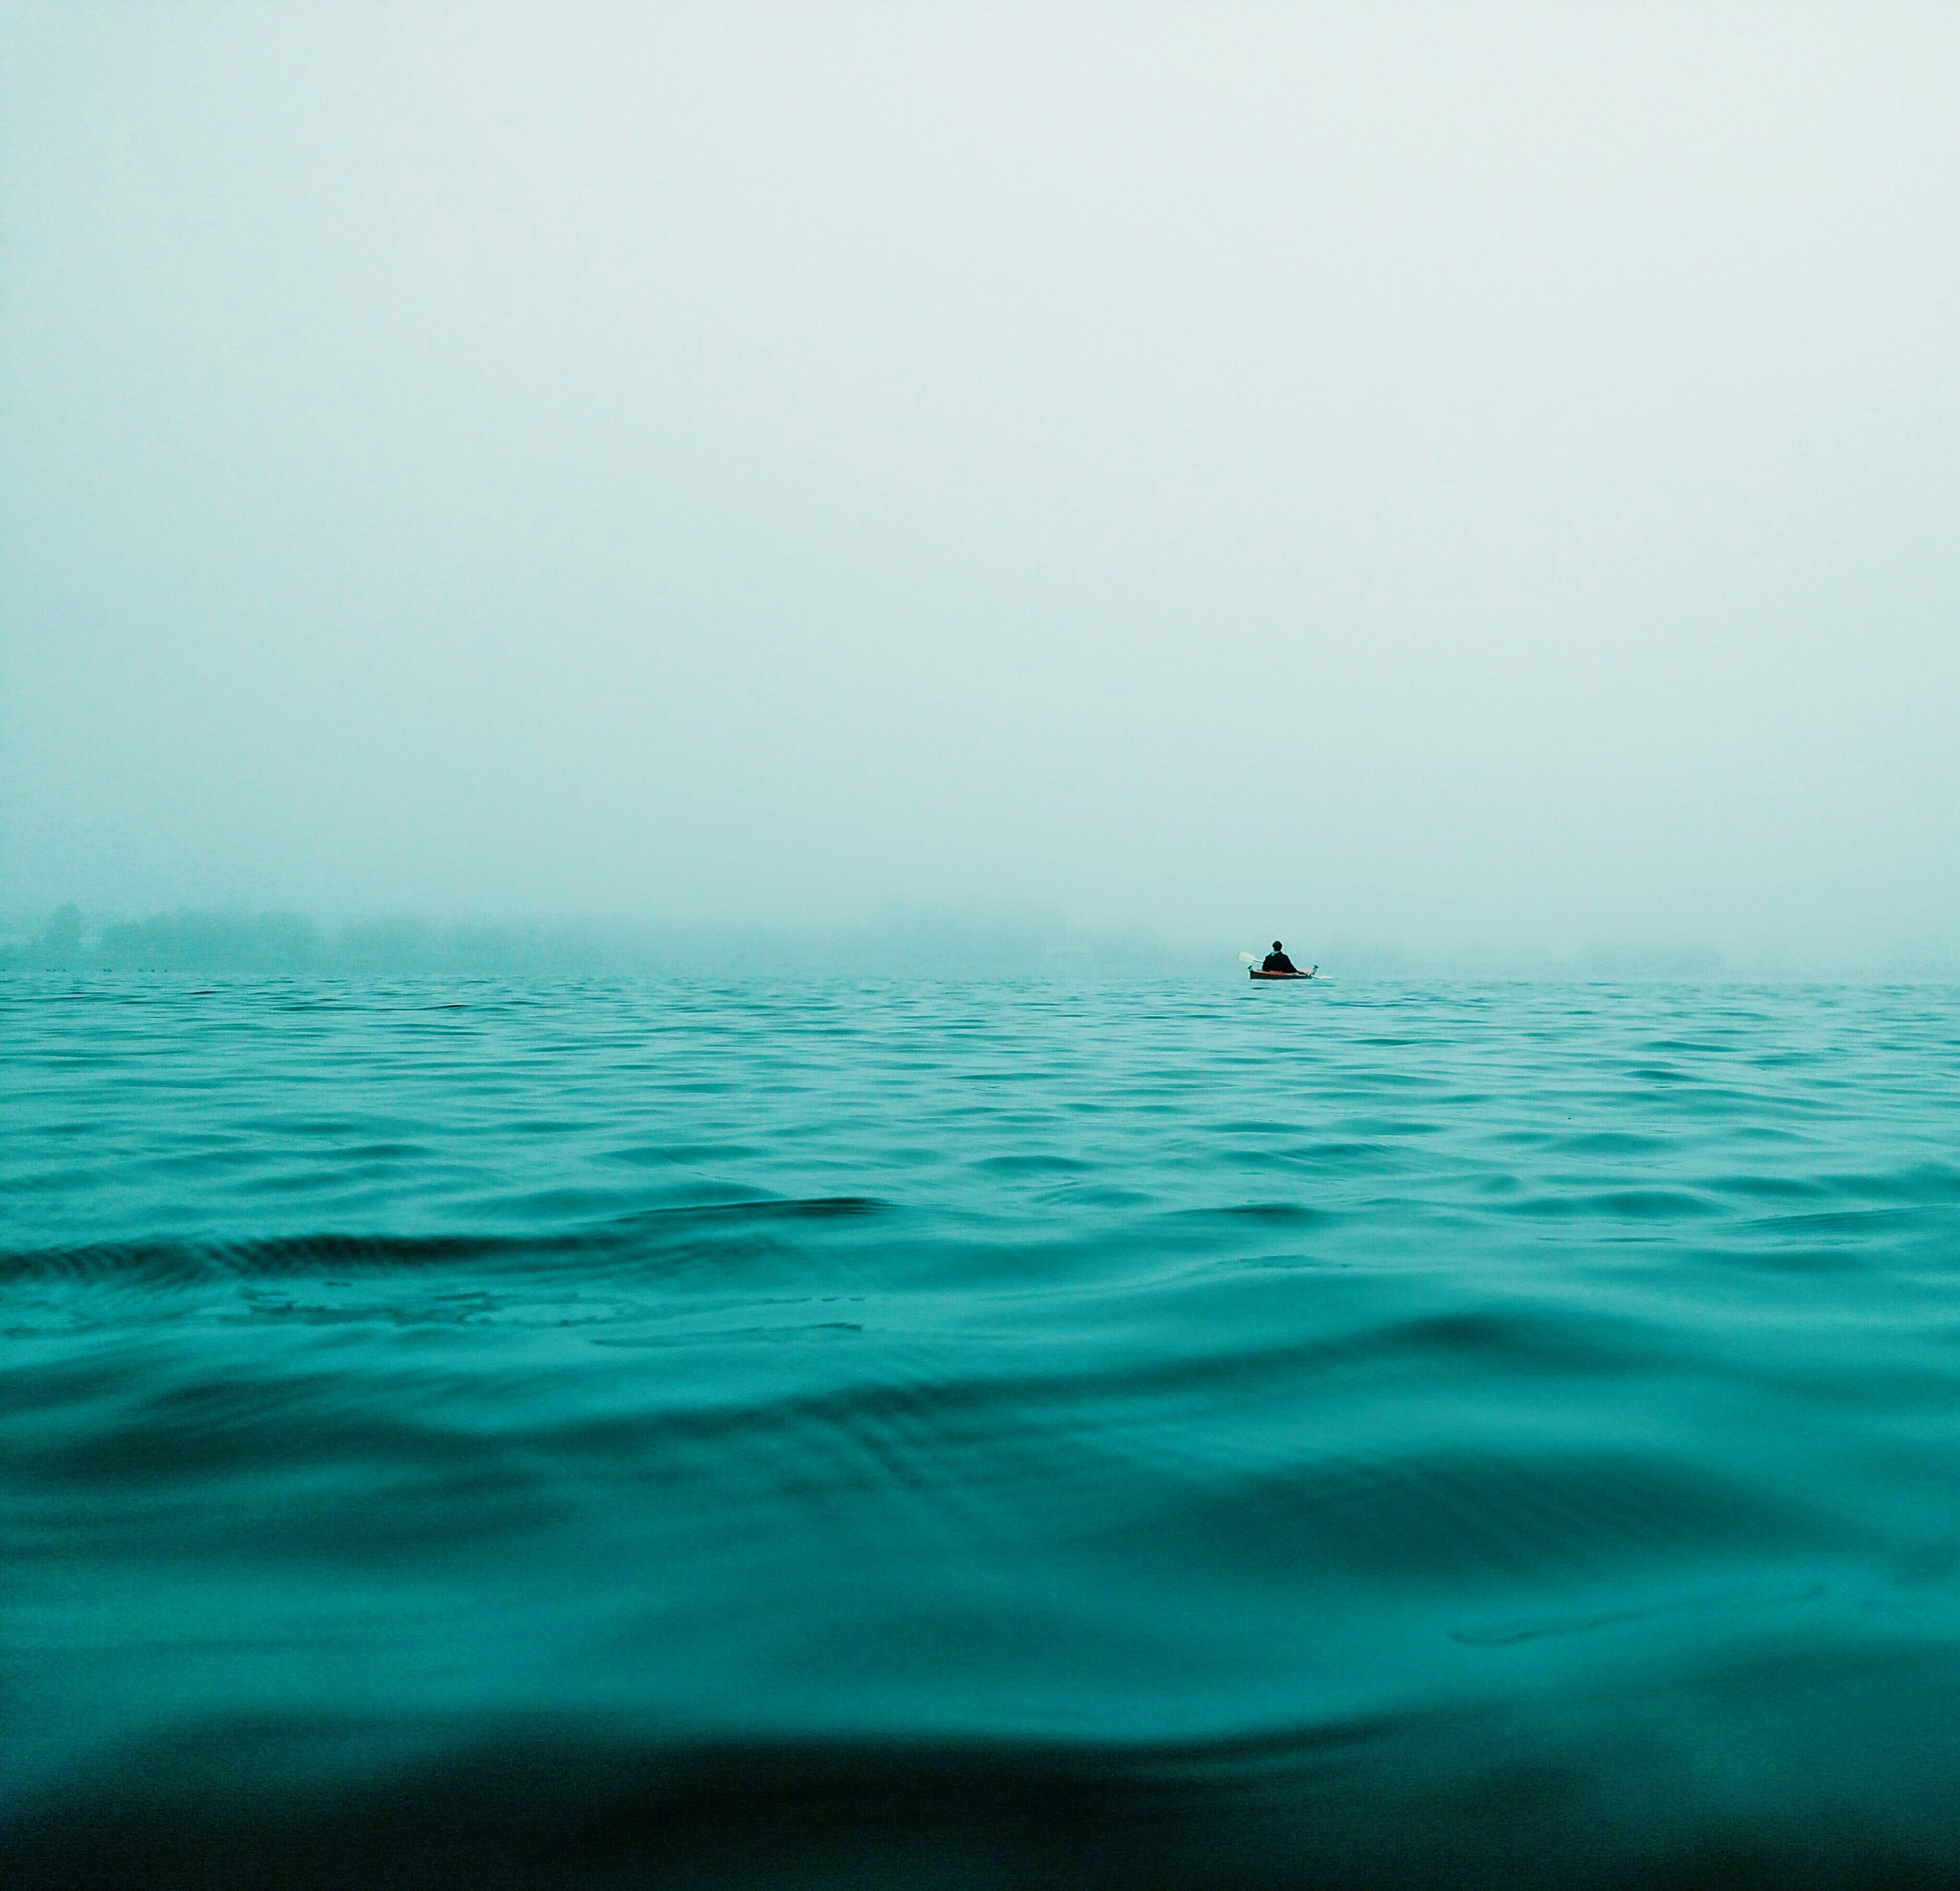 Alone blue ocean